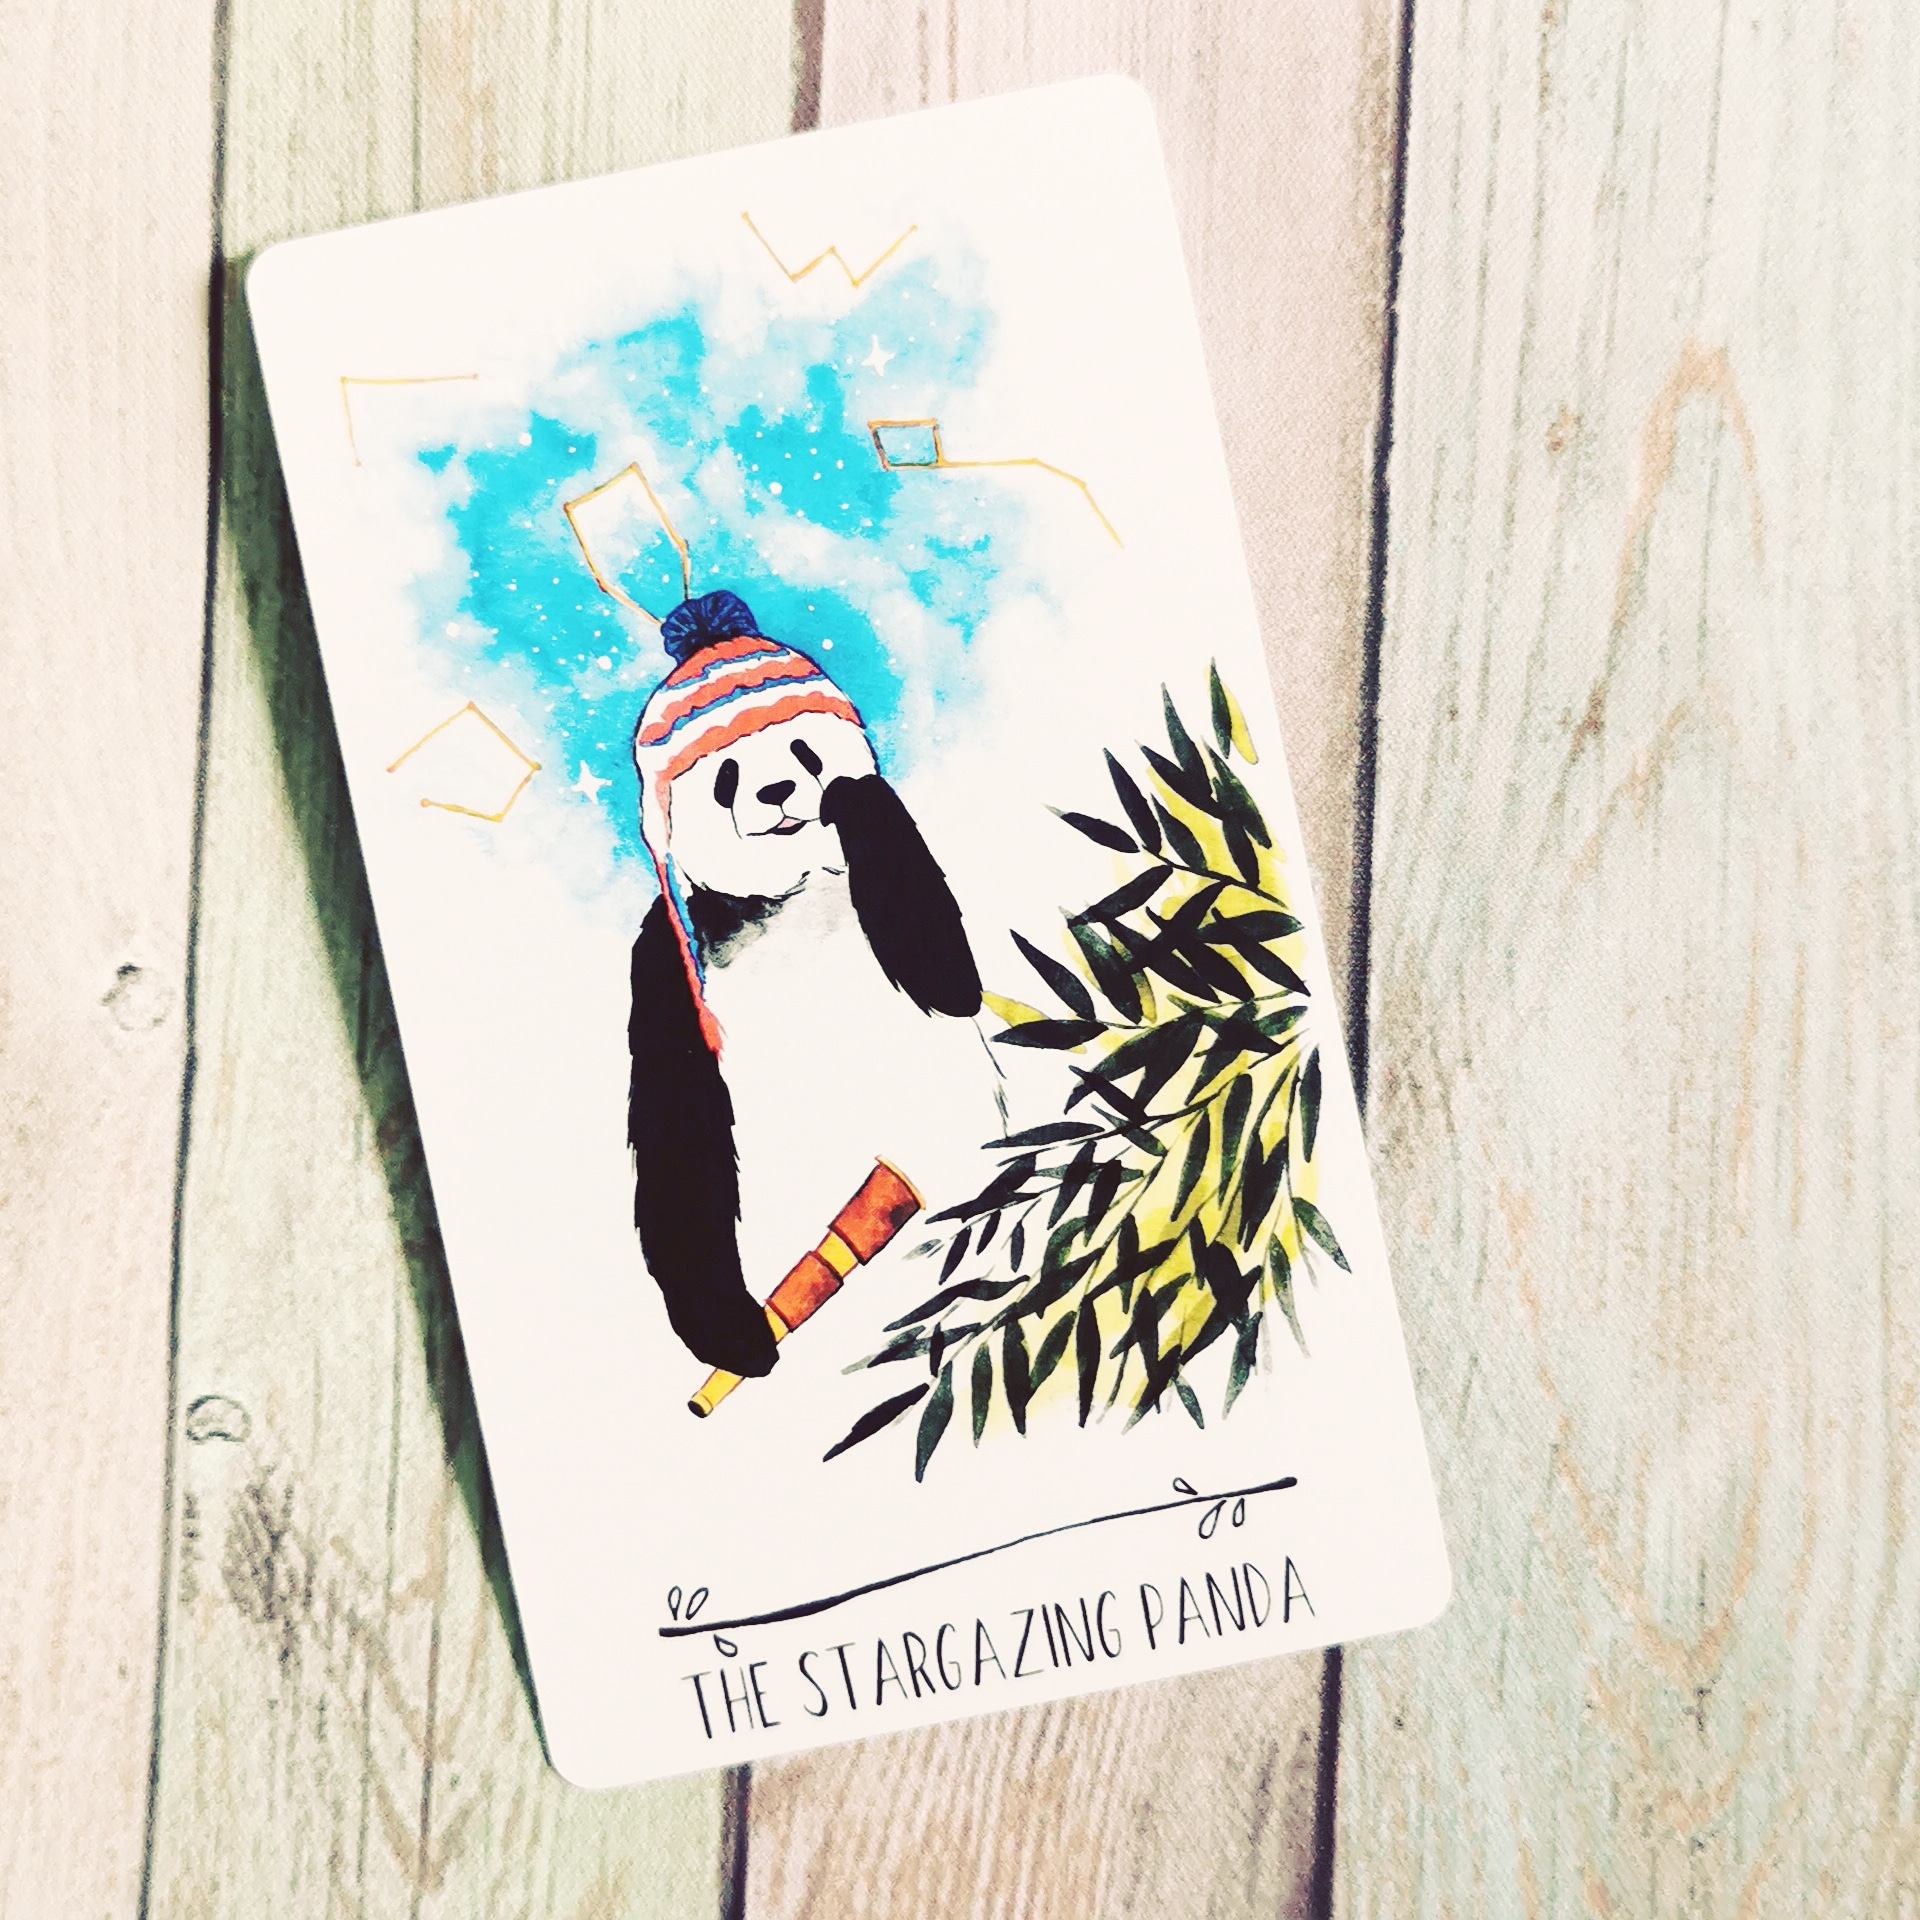 THE STARGAZING PANDA:  ASTROLOGY, DIVINITY, PRAYER & PHILOSOPHY